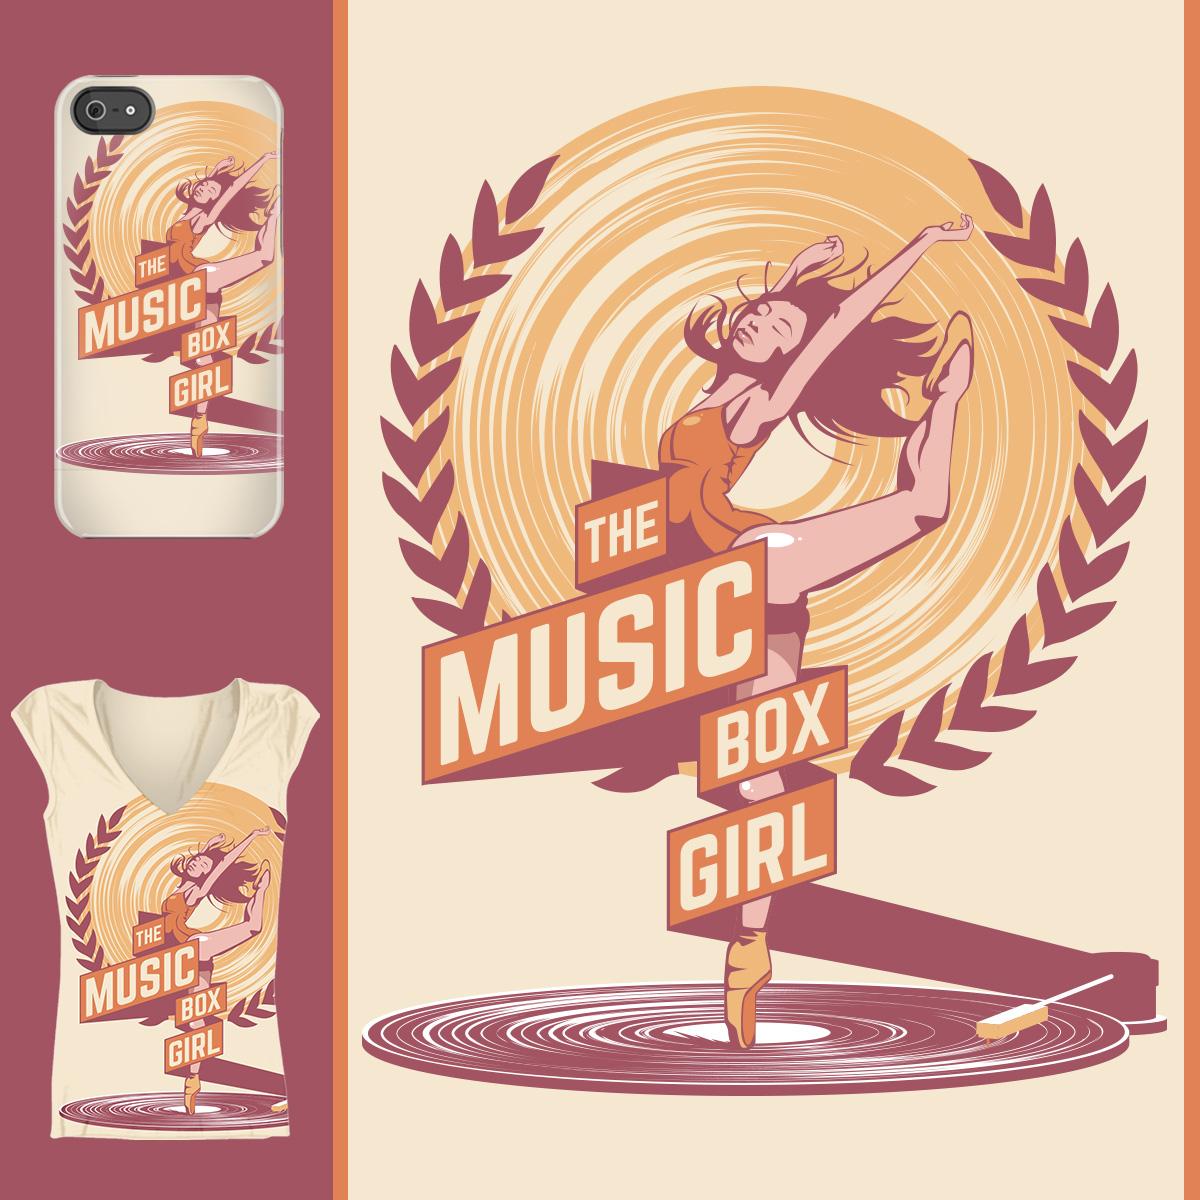 THE MUSIC BOX GIRL by NARRVITA on Threadless